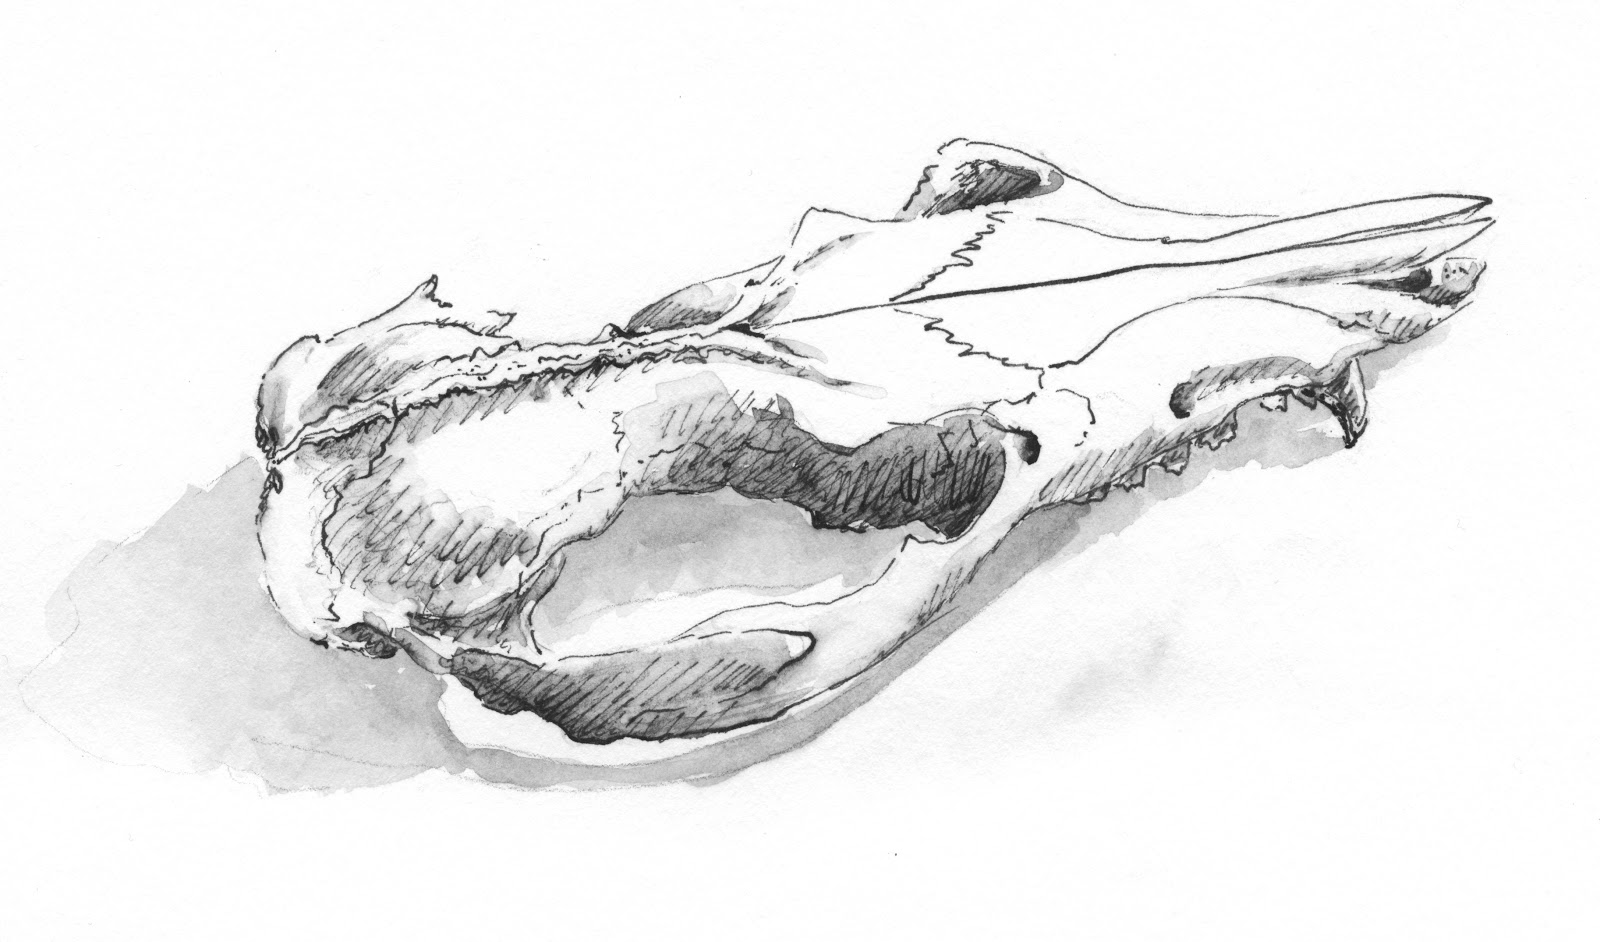 Sketching in Nature: 'Possum